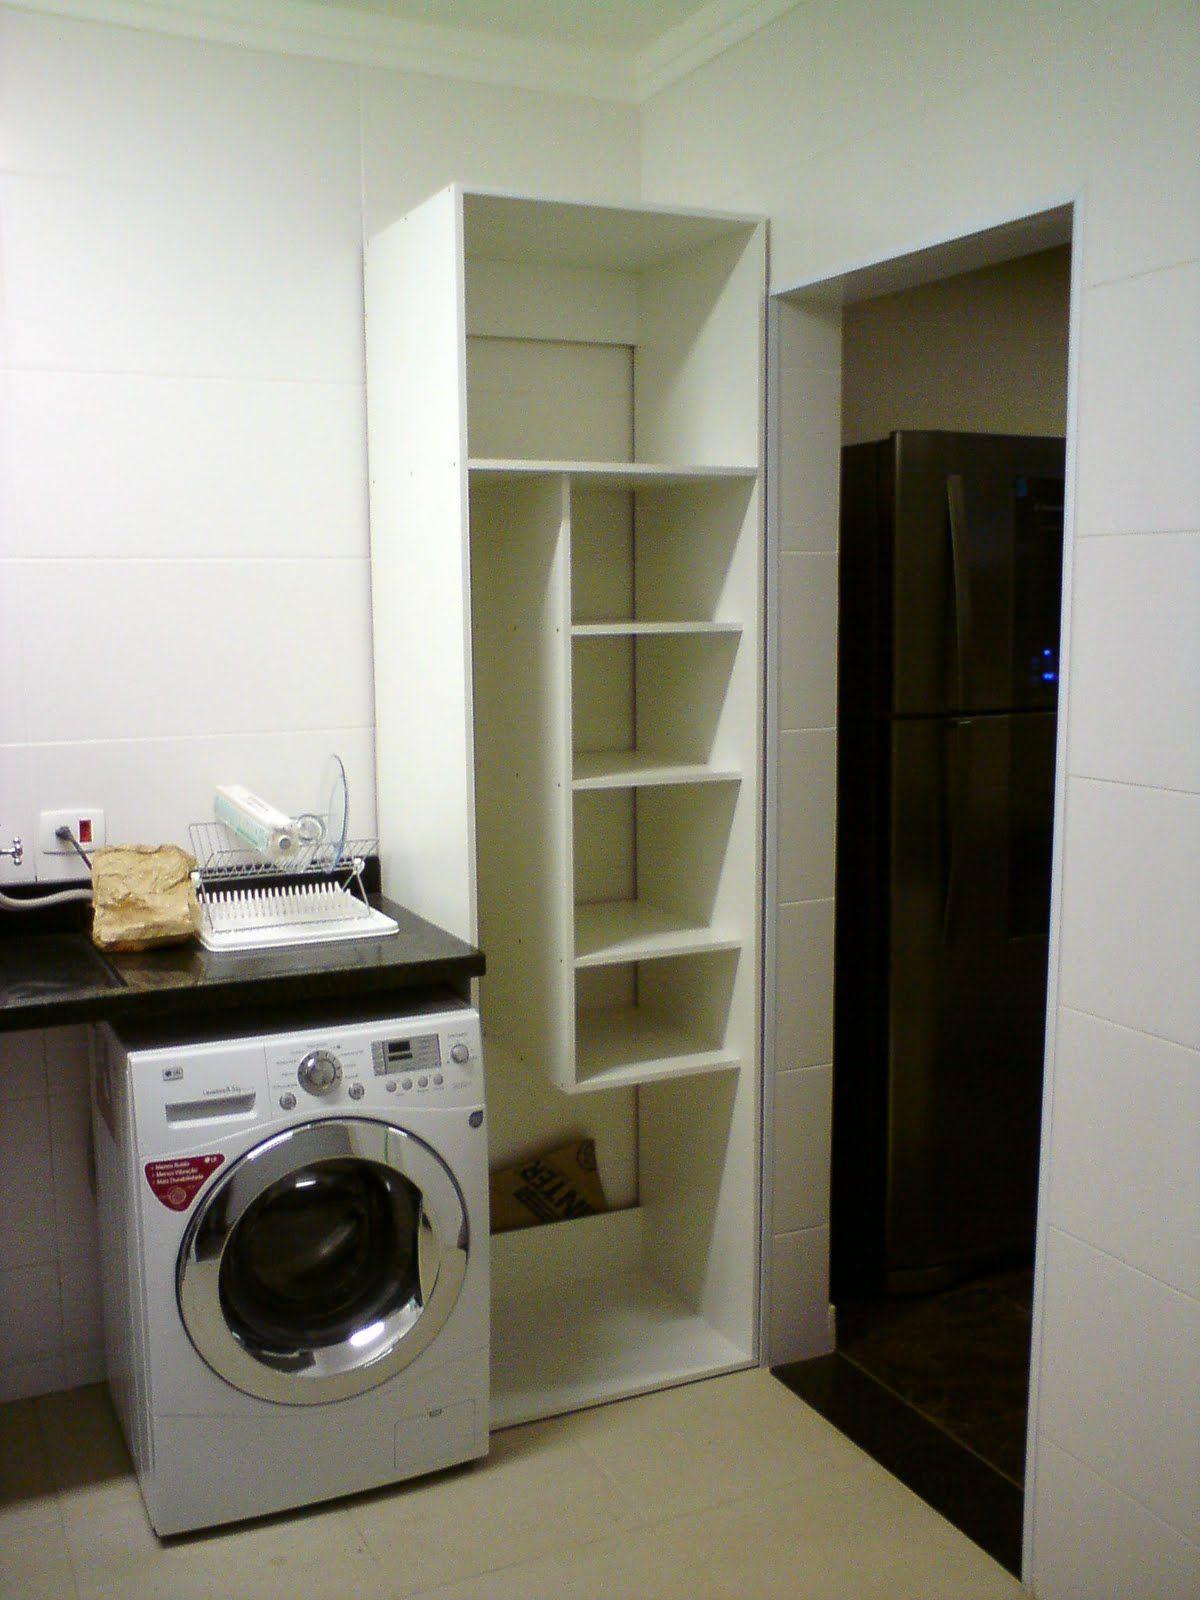 Adesivo Quarto De Bebe Nuvens ~ armario lavanderia Ideias inspiradoras Pinterest Armario lavanderia, Lavanderia e Armário